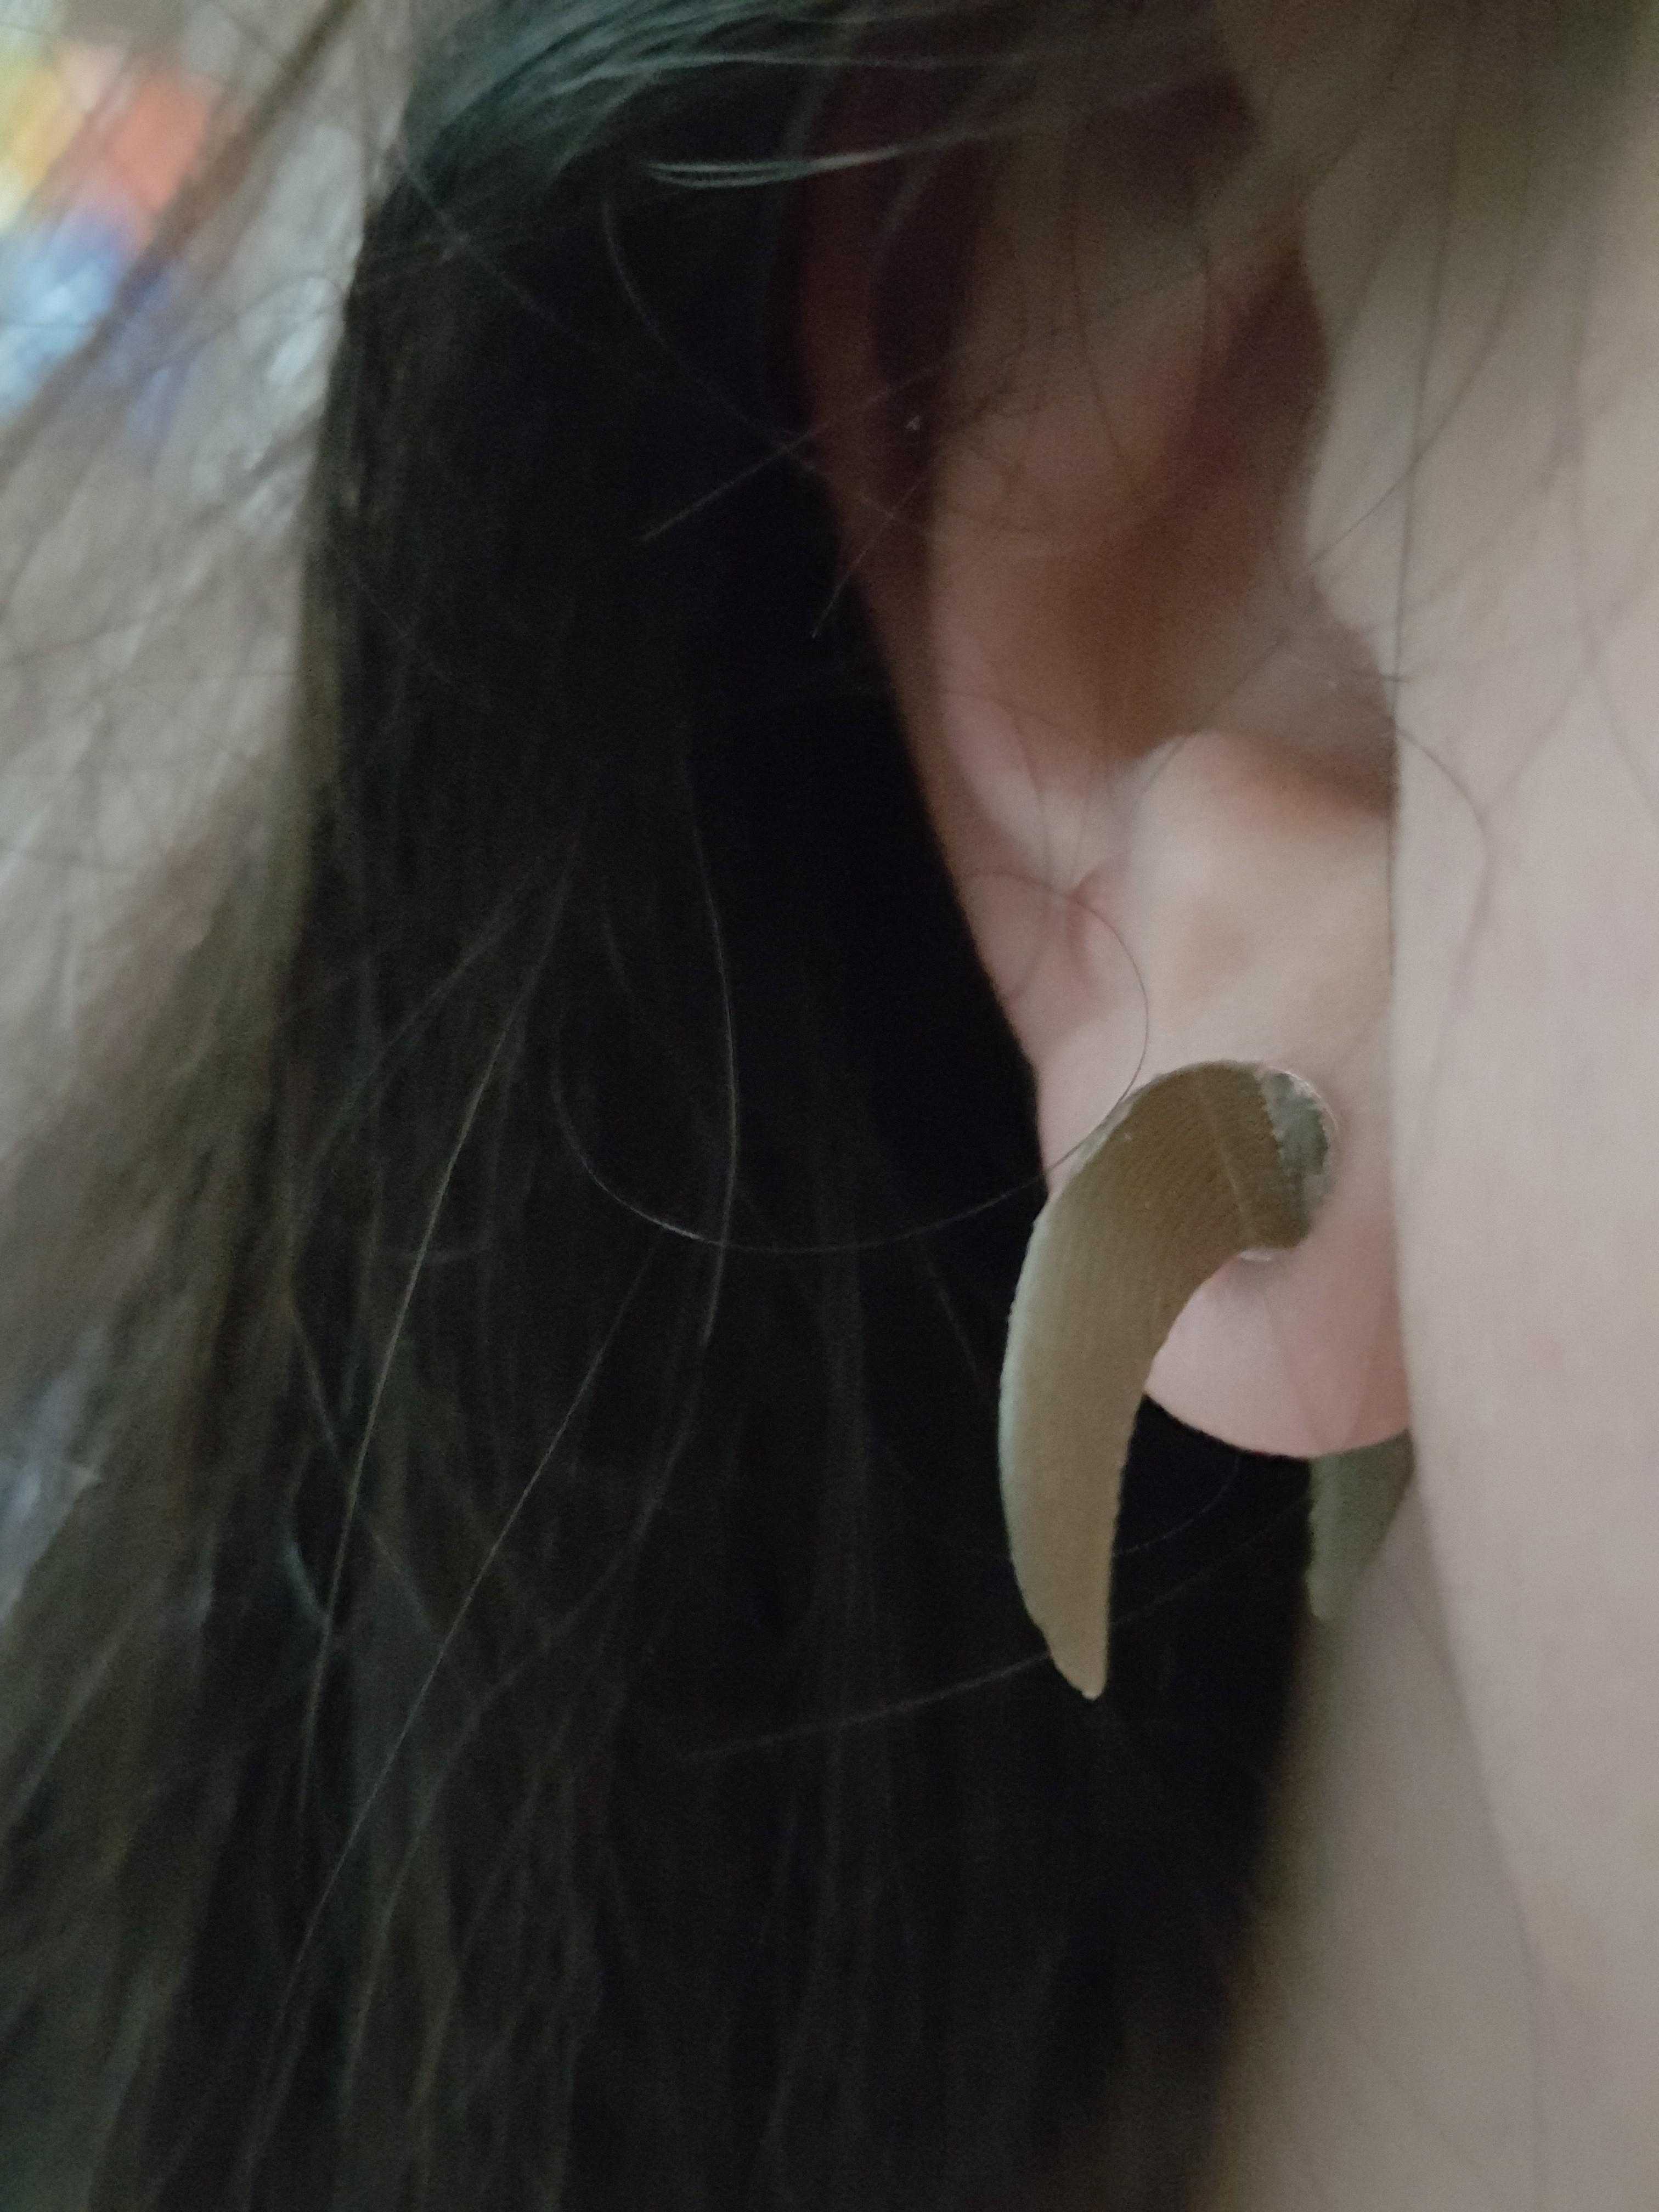 20180202_091355.jpg Download STL file earring horns • 3D print template, catf3d